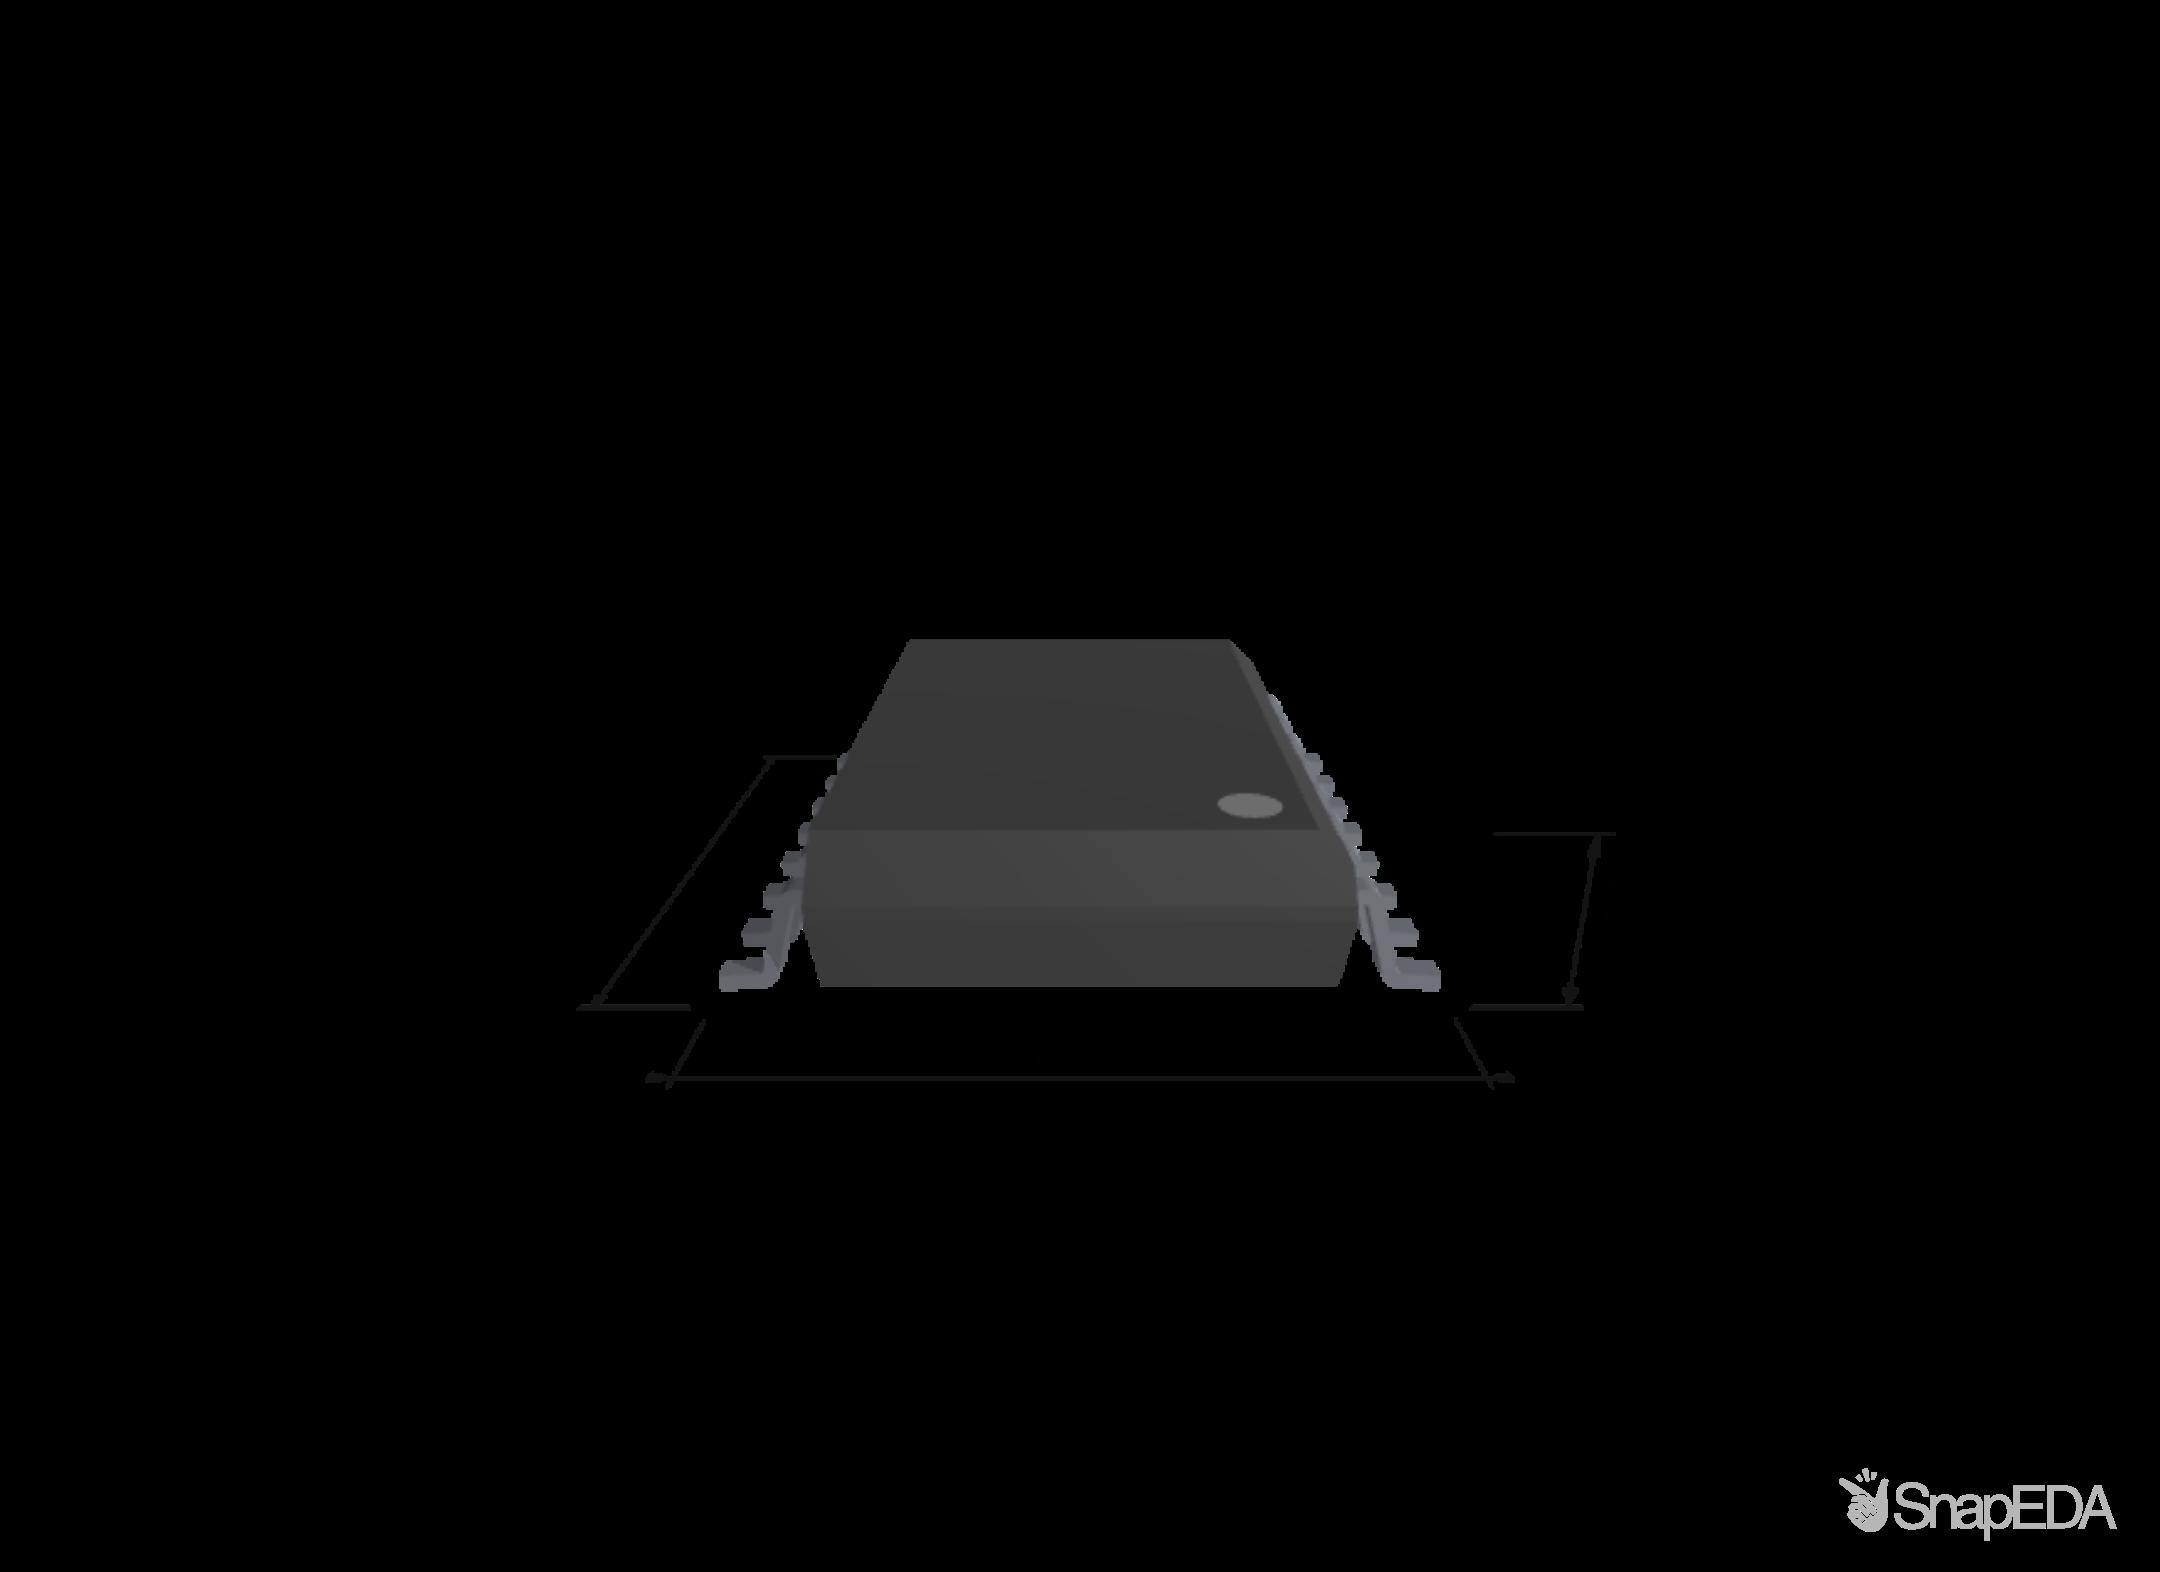 UCC21520DWR 3D Model